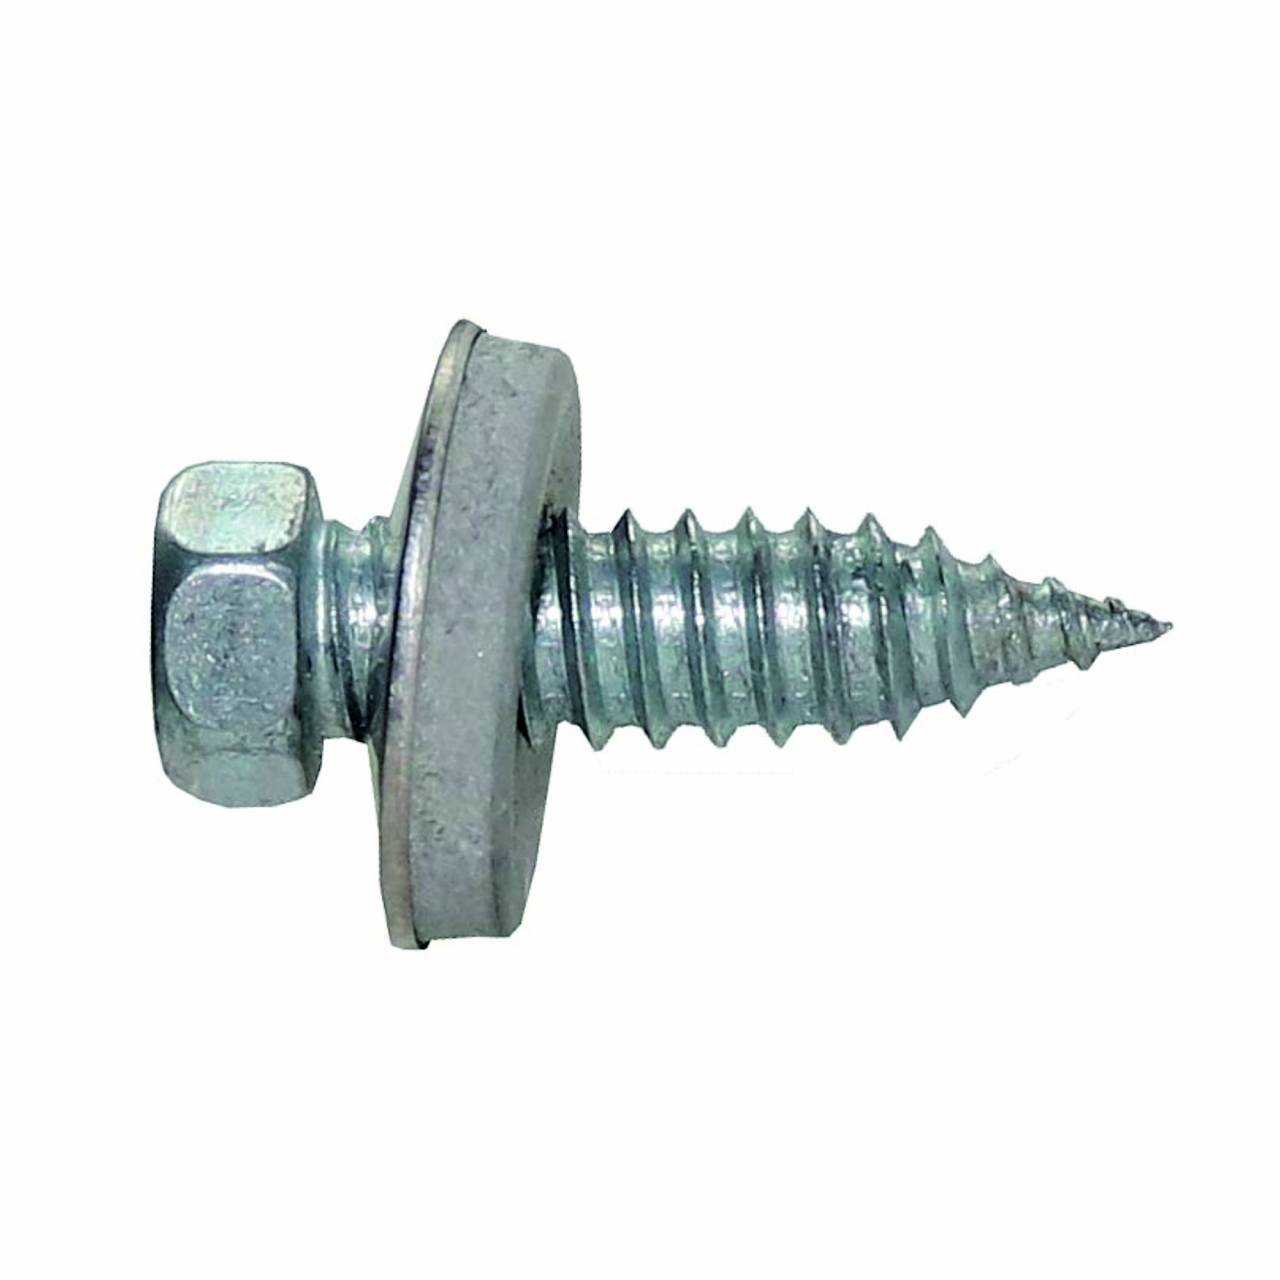 Reparaturschraube E-XR® 19 AB Edelstahl 7,2 x 38 mm / Pck a 100 Stück